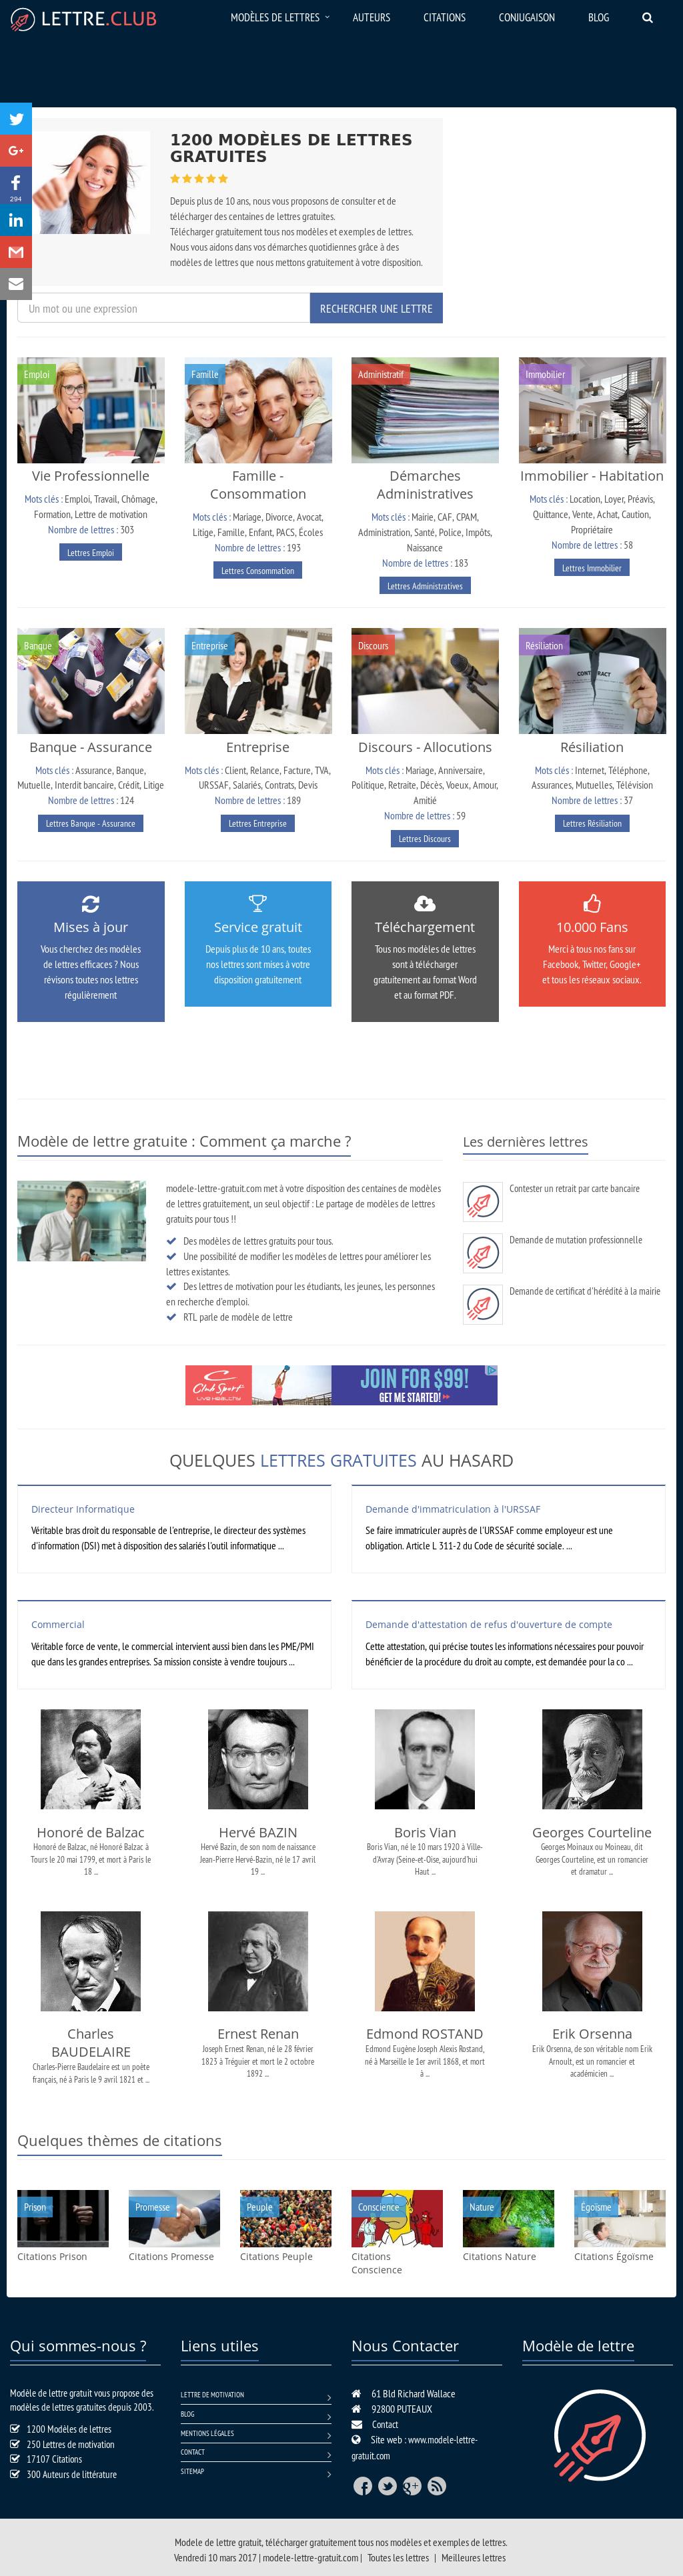 Modele De Lettre Gratuit S Competitors Revenue Number Of Employees Funding Acquisitions News Owler Company Profile